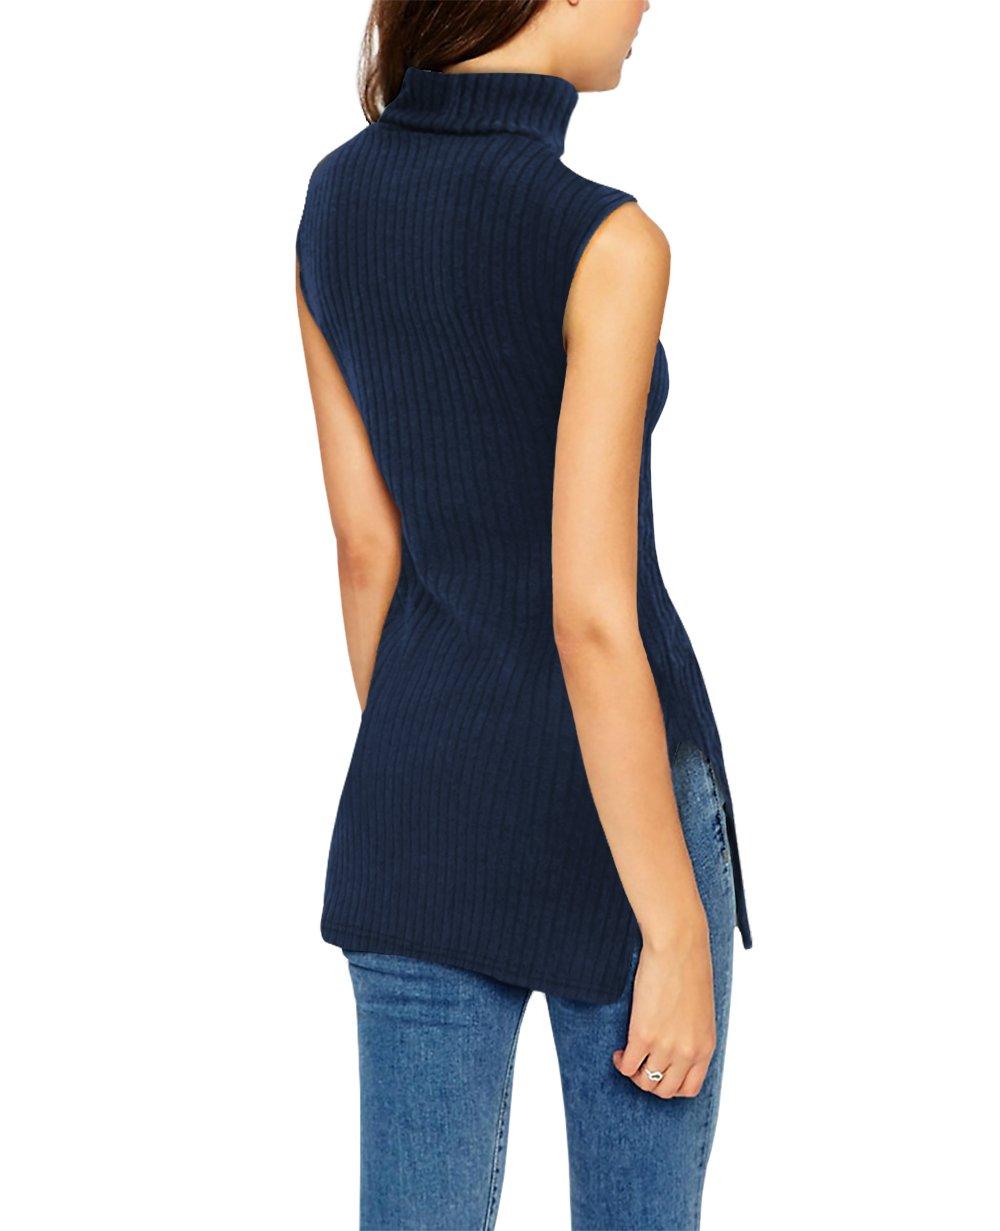 Womens Super Comfy Sleeveless Turtleneck Tunic Sweater KT45224 X 03126 Navy 2X